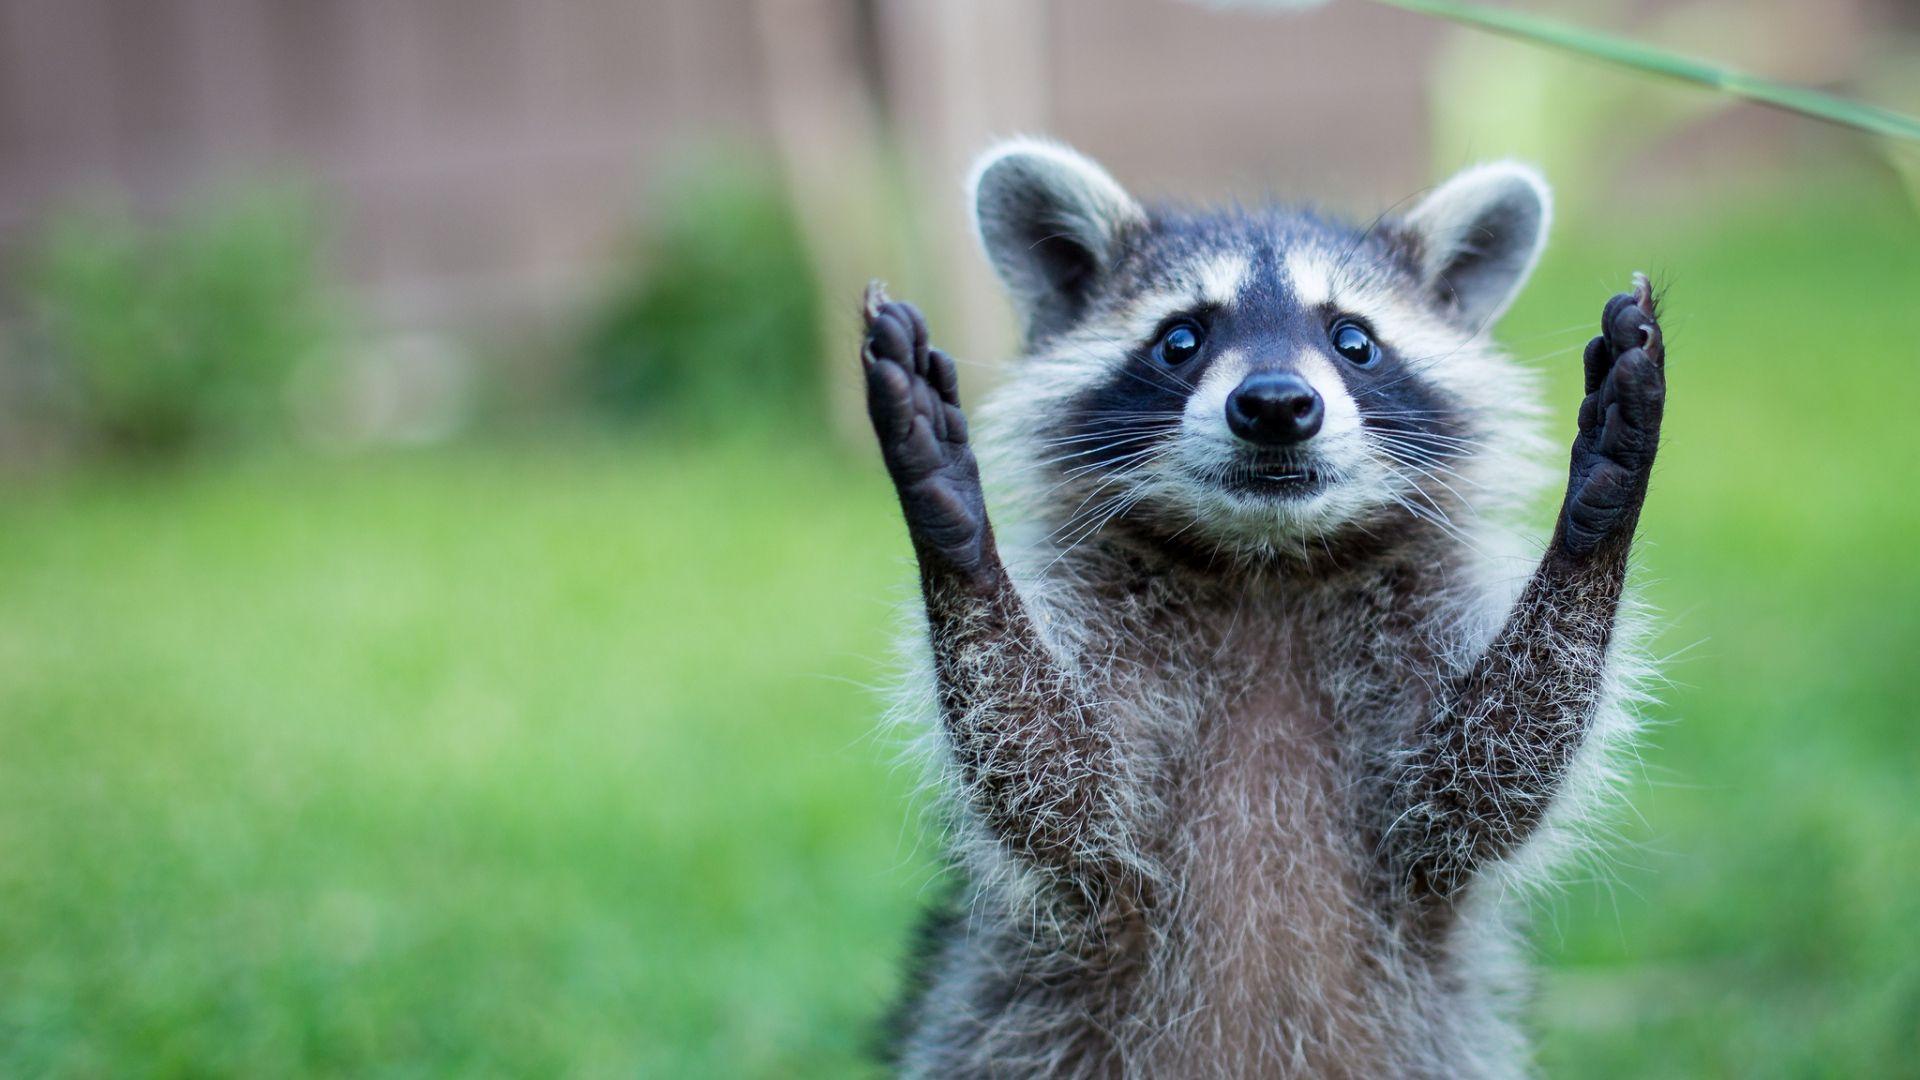 funny animal raccoon paws | Wild animal wallpaper, Deadly animals